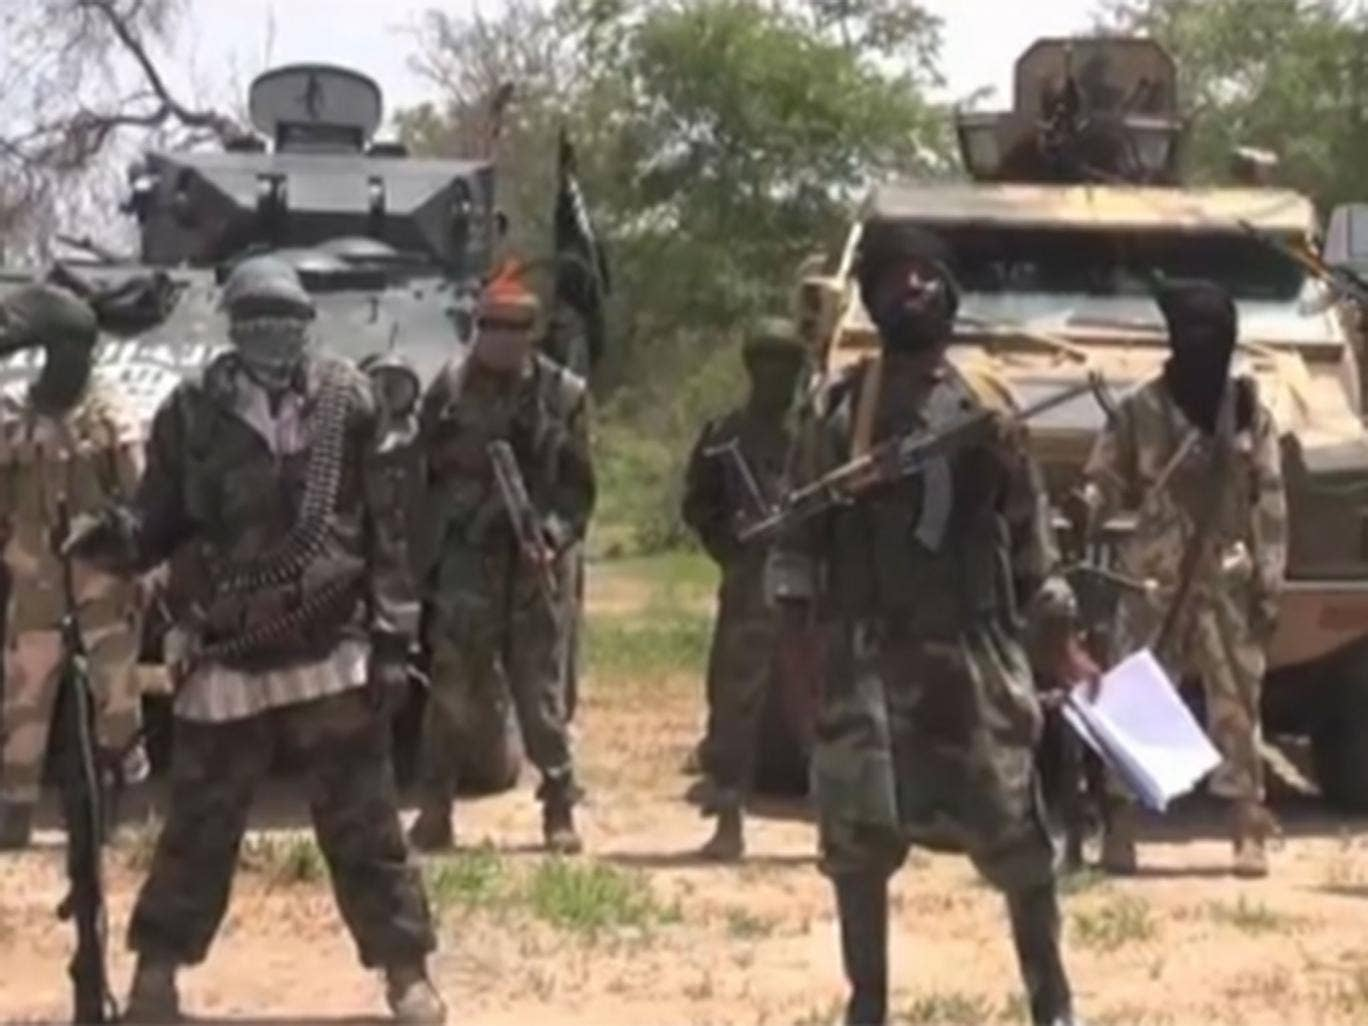 Boko Haram's leader Abubakar Shekau (R) delivers his message